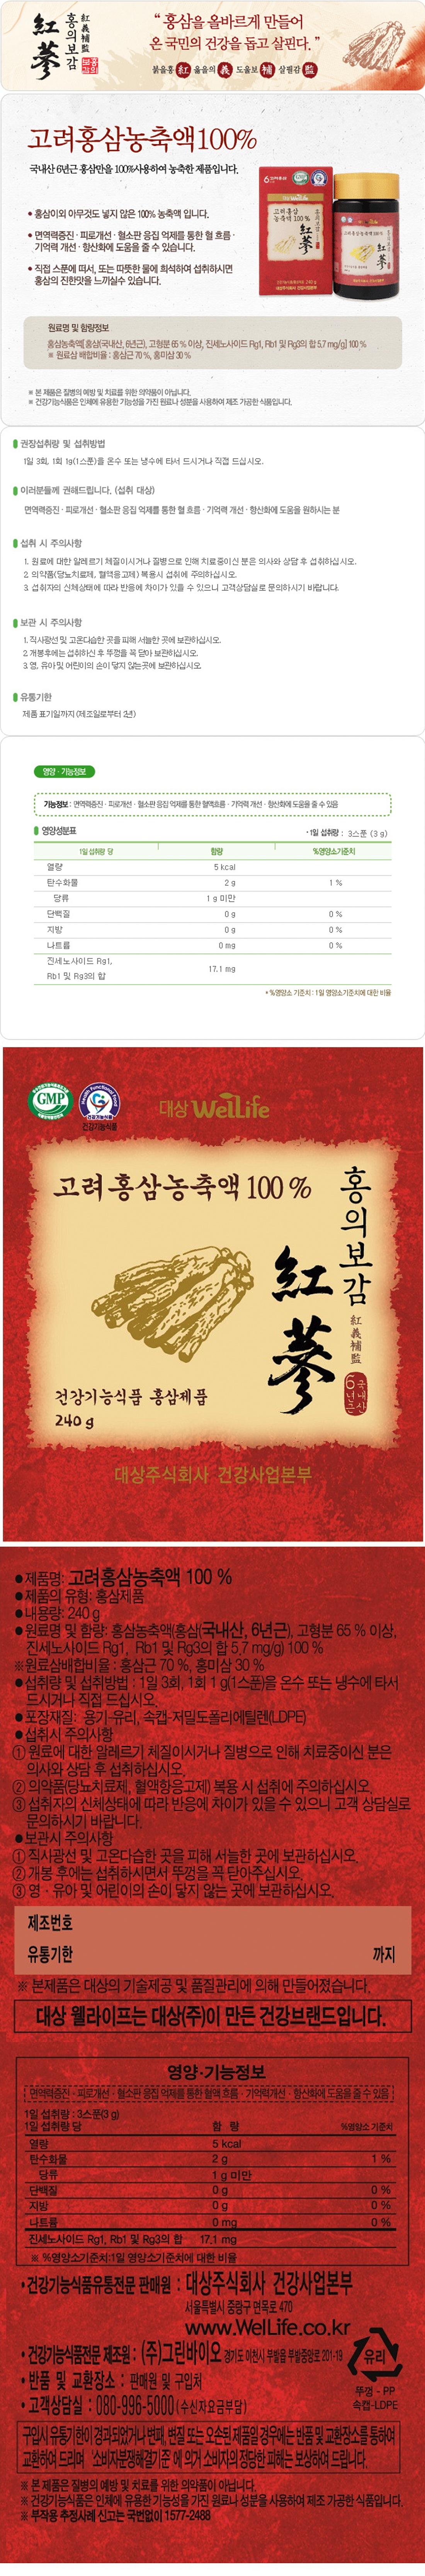 [ wellife ] 红参提取 240g